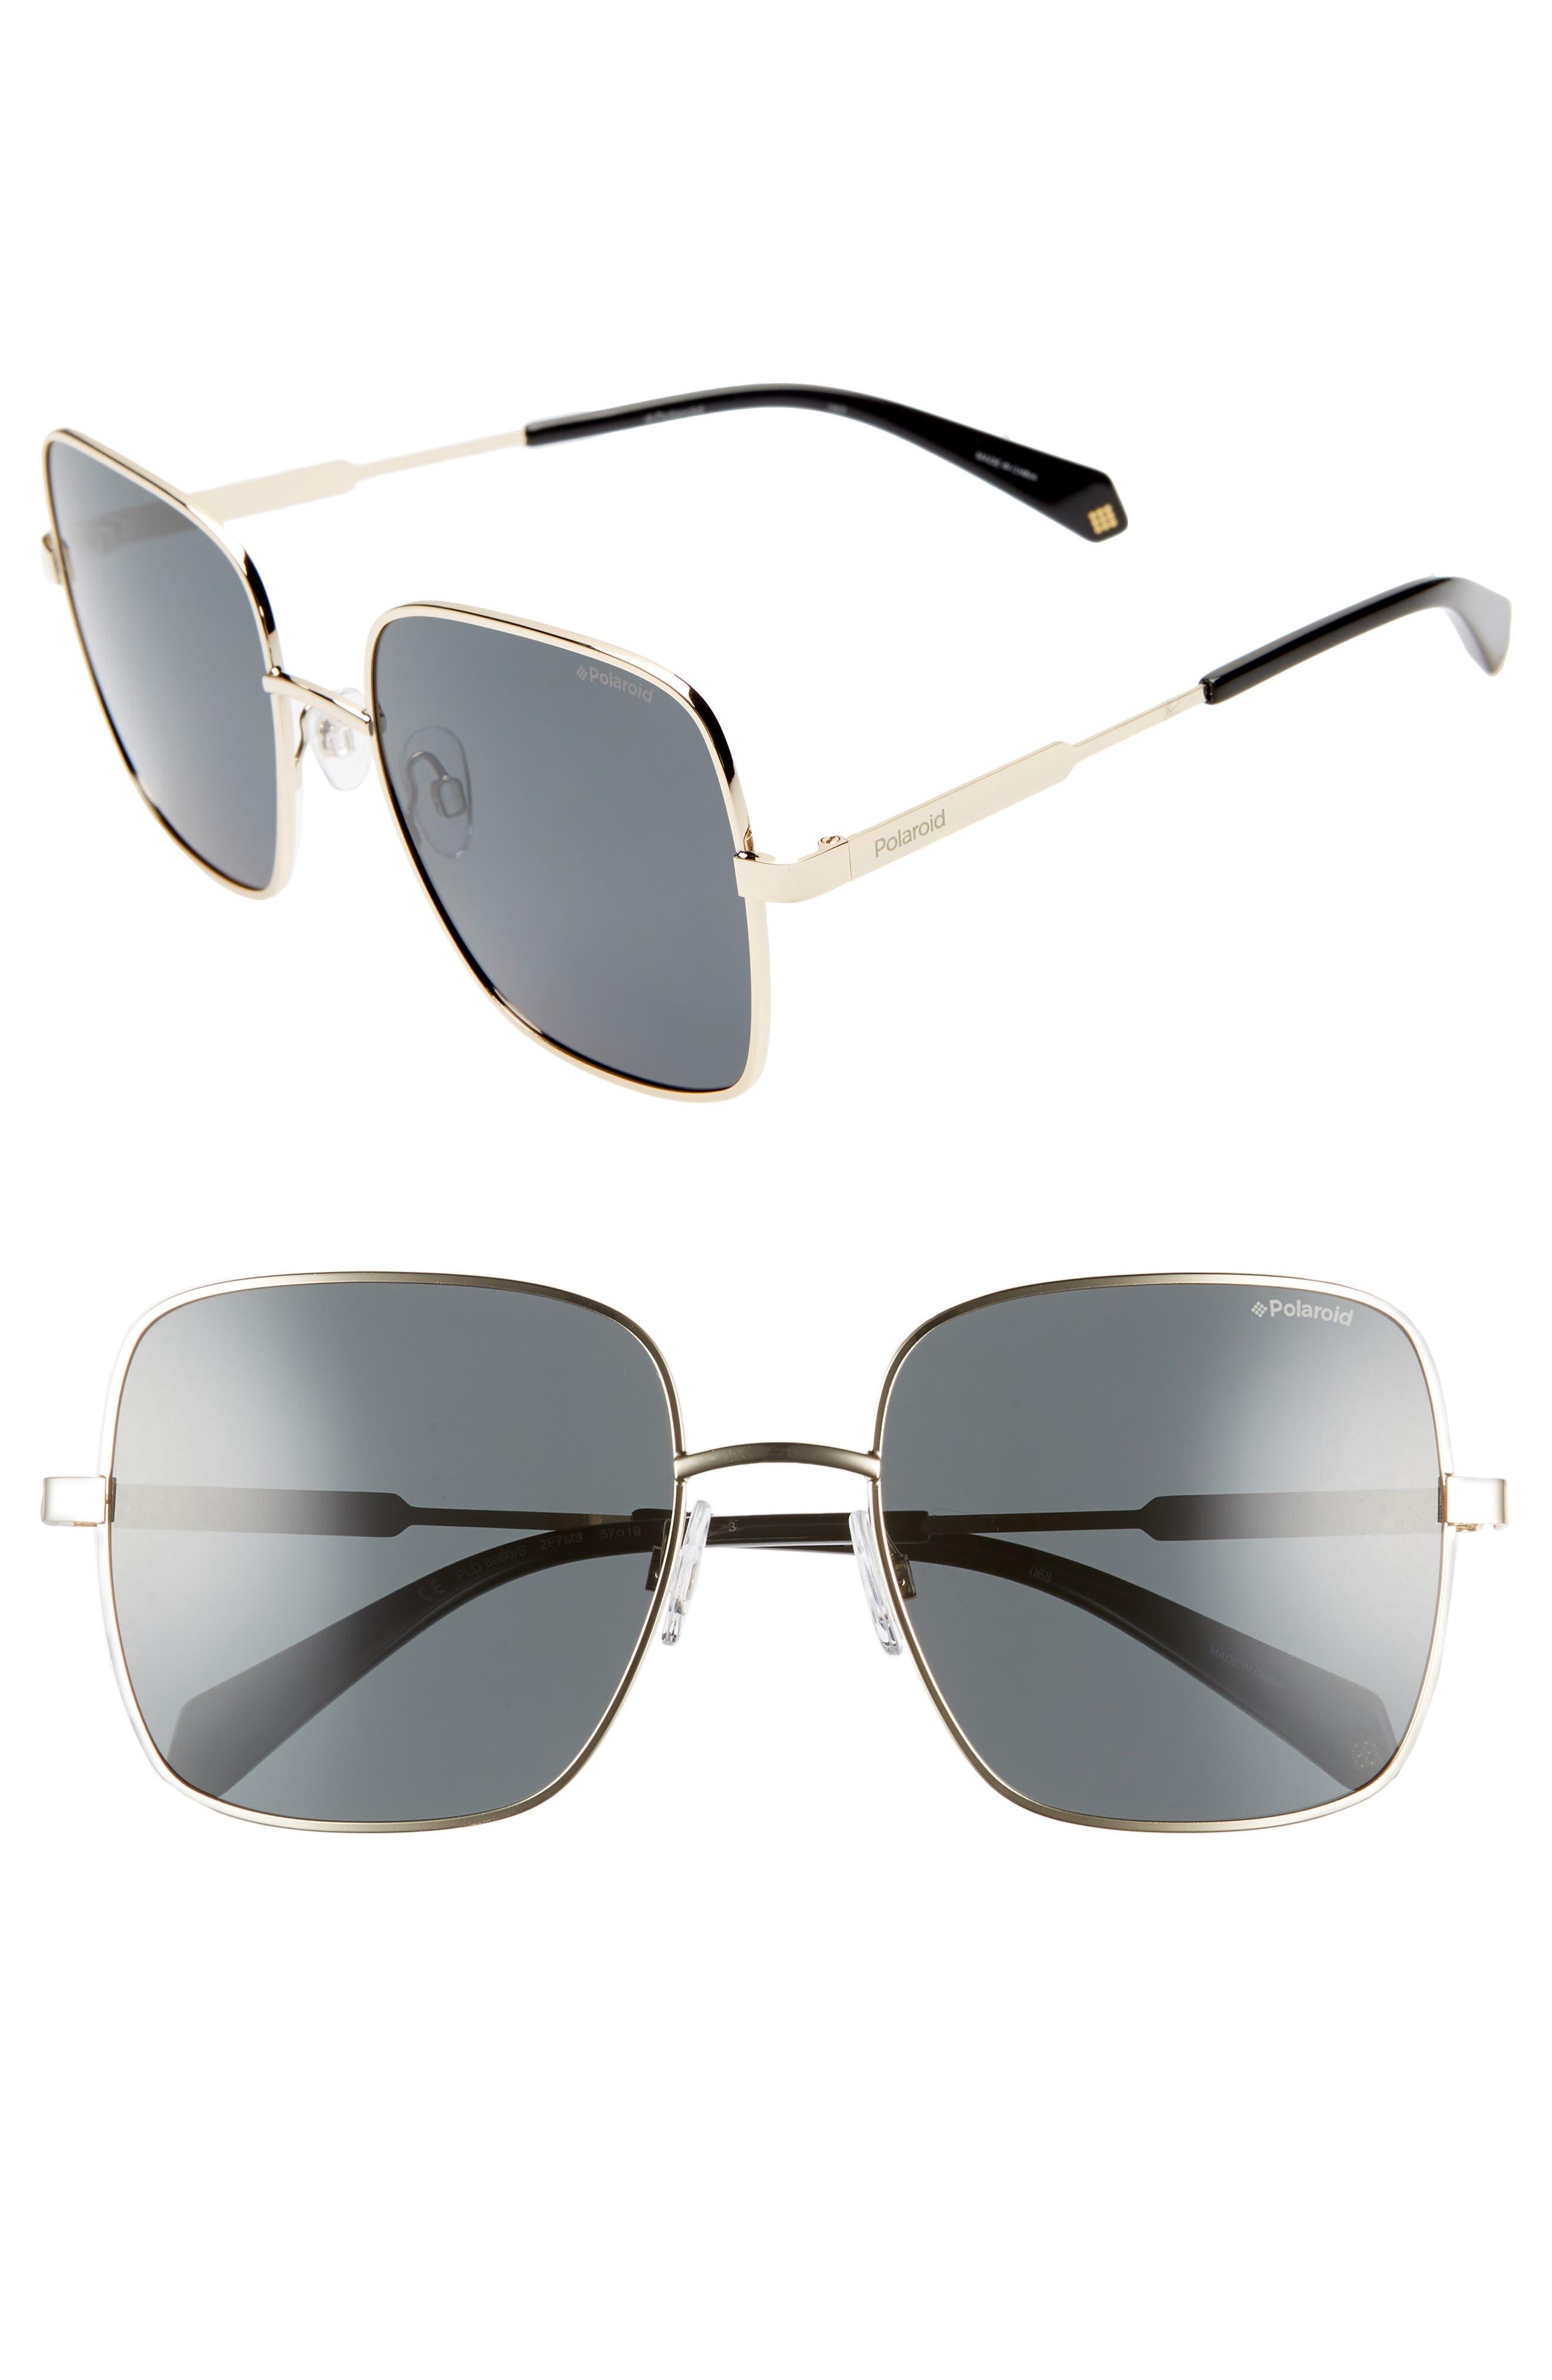 Polaroid 57Mm Polarized Square Sunglasses -